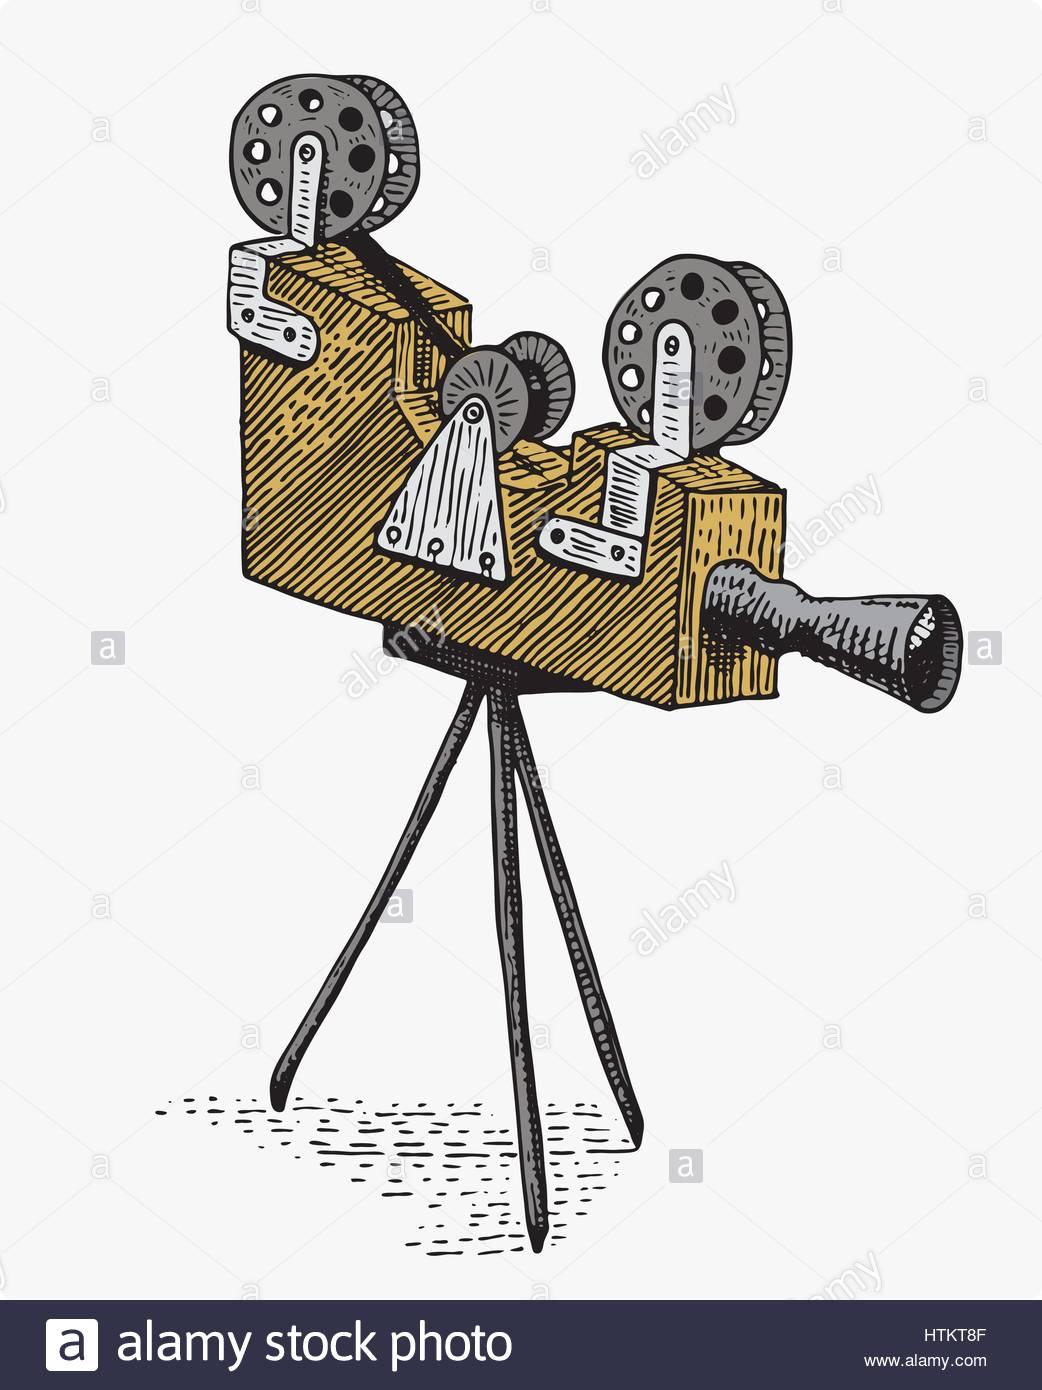 1042x1390 Photo Movie Or Film Camera Vintage, Engraved, Hand Drawn In Sketch